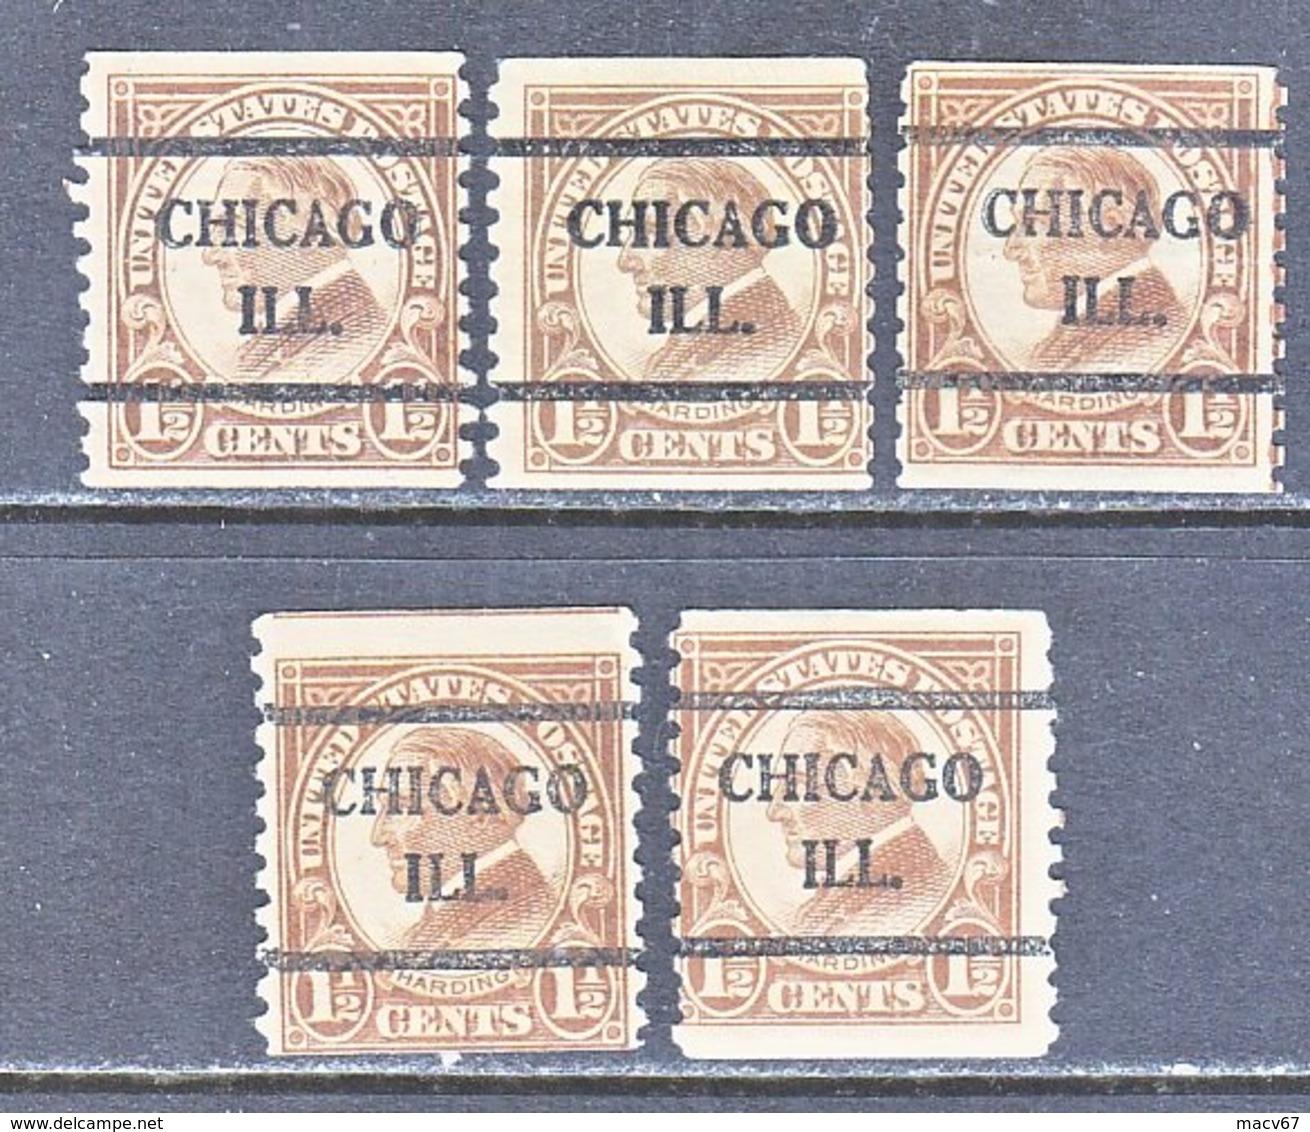 U.S. 598   Perf. 10   (o)   ILLINOIS      1925   Issue - Precancels